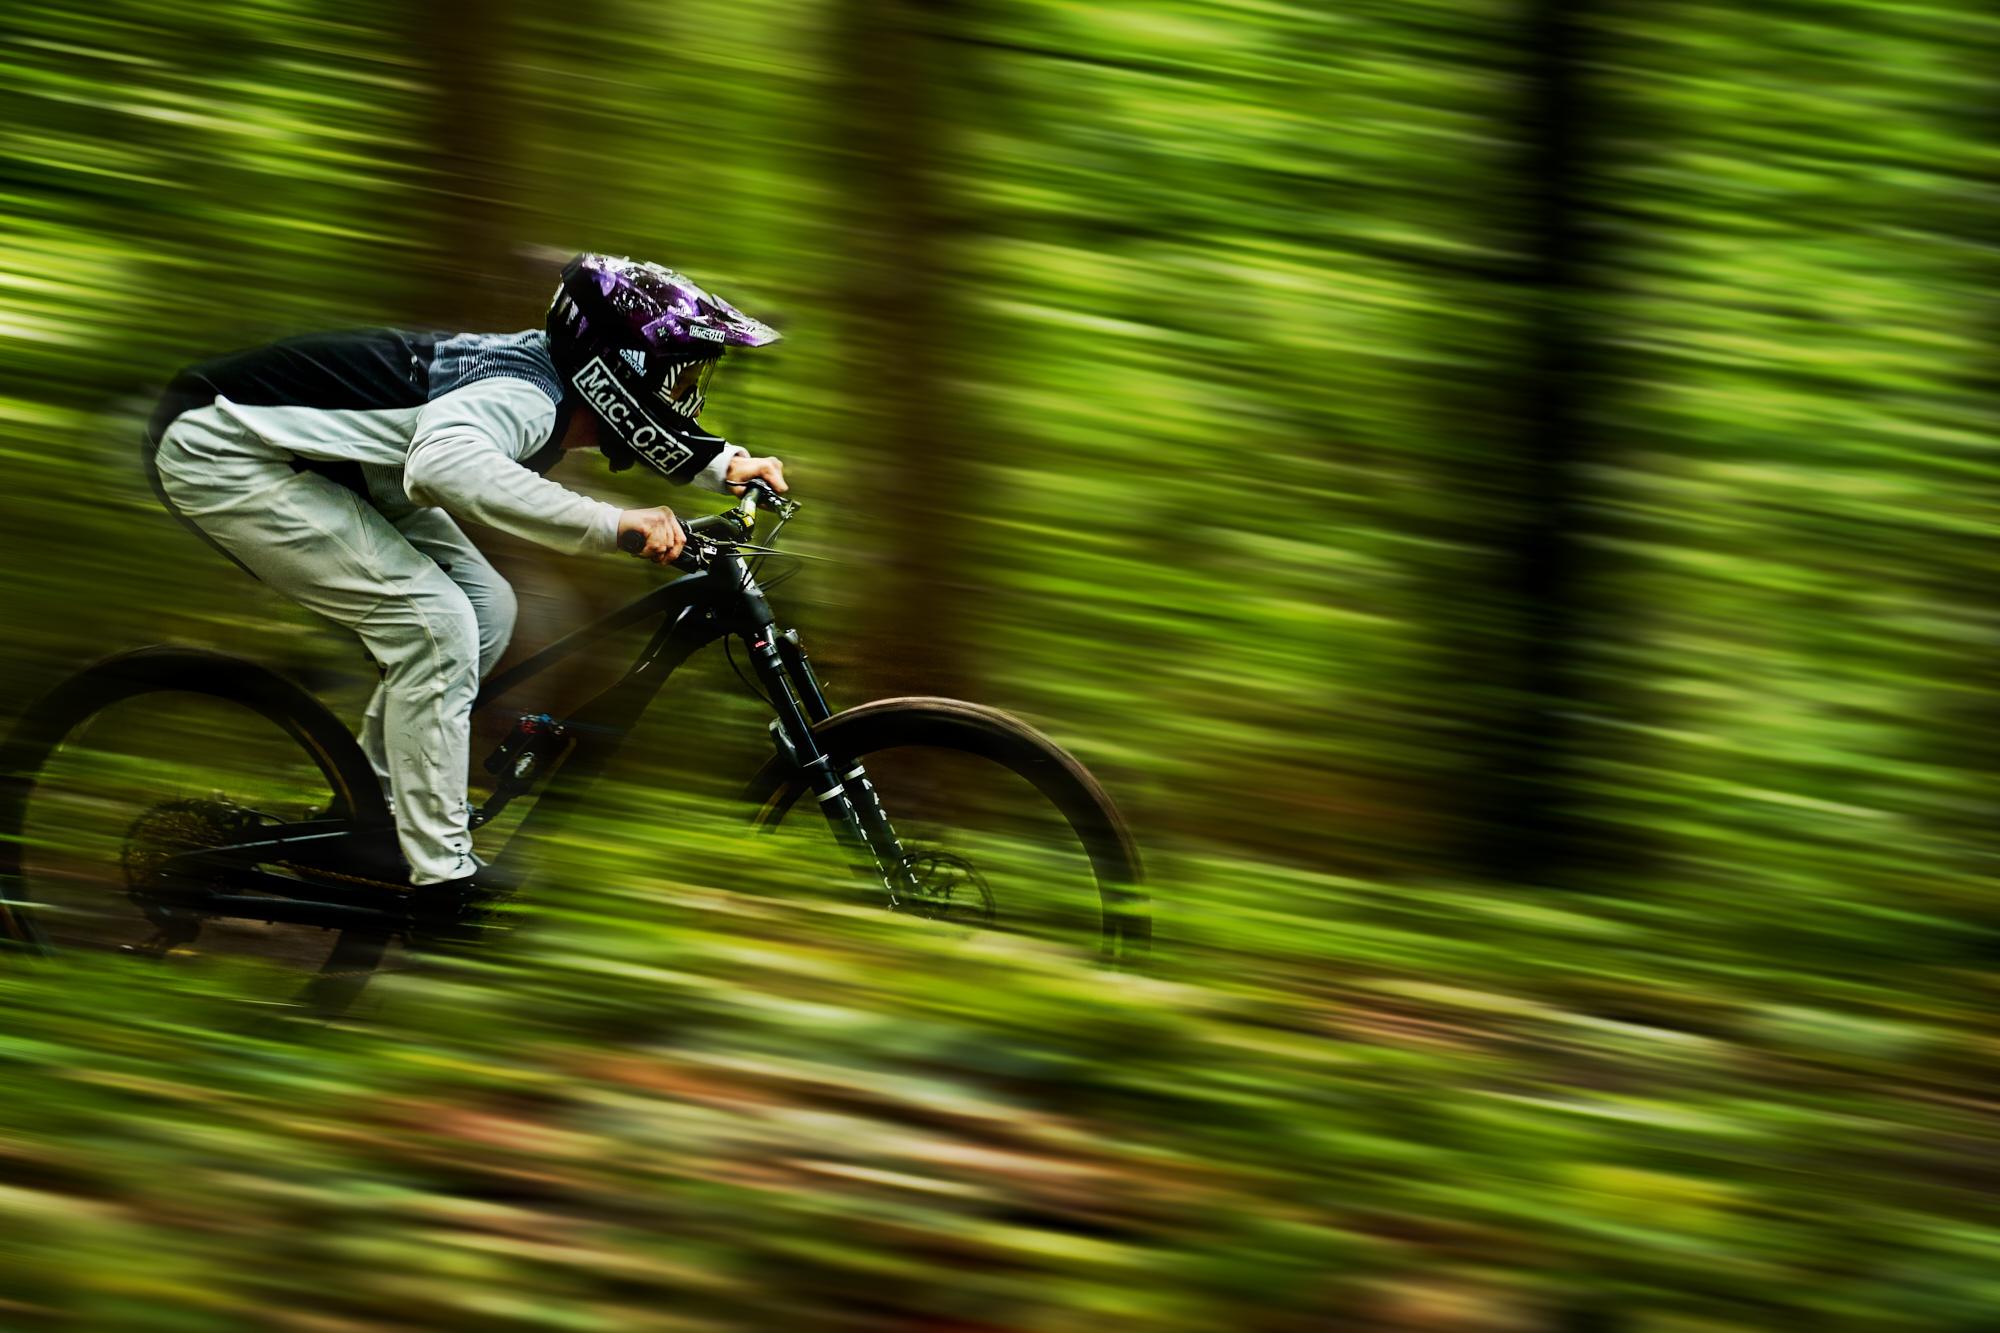 Hannes Klausner - Custom Helmet Image 4